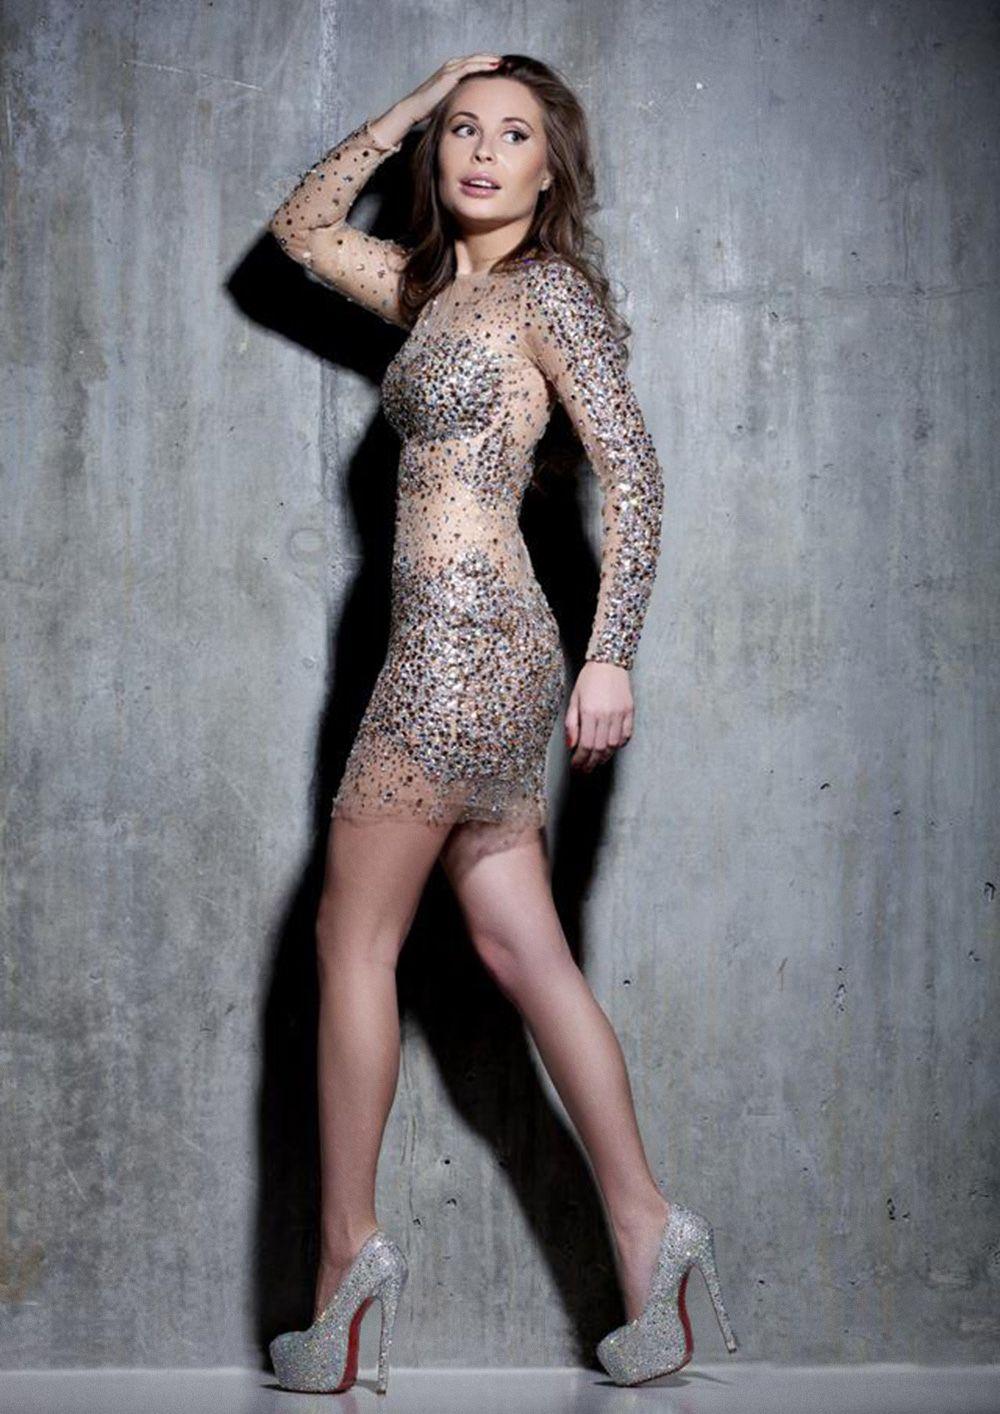 Best HD Photos Wallpapers Pics of Yuliya Mikhalkova